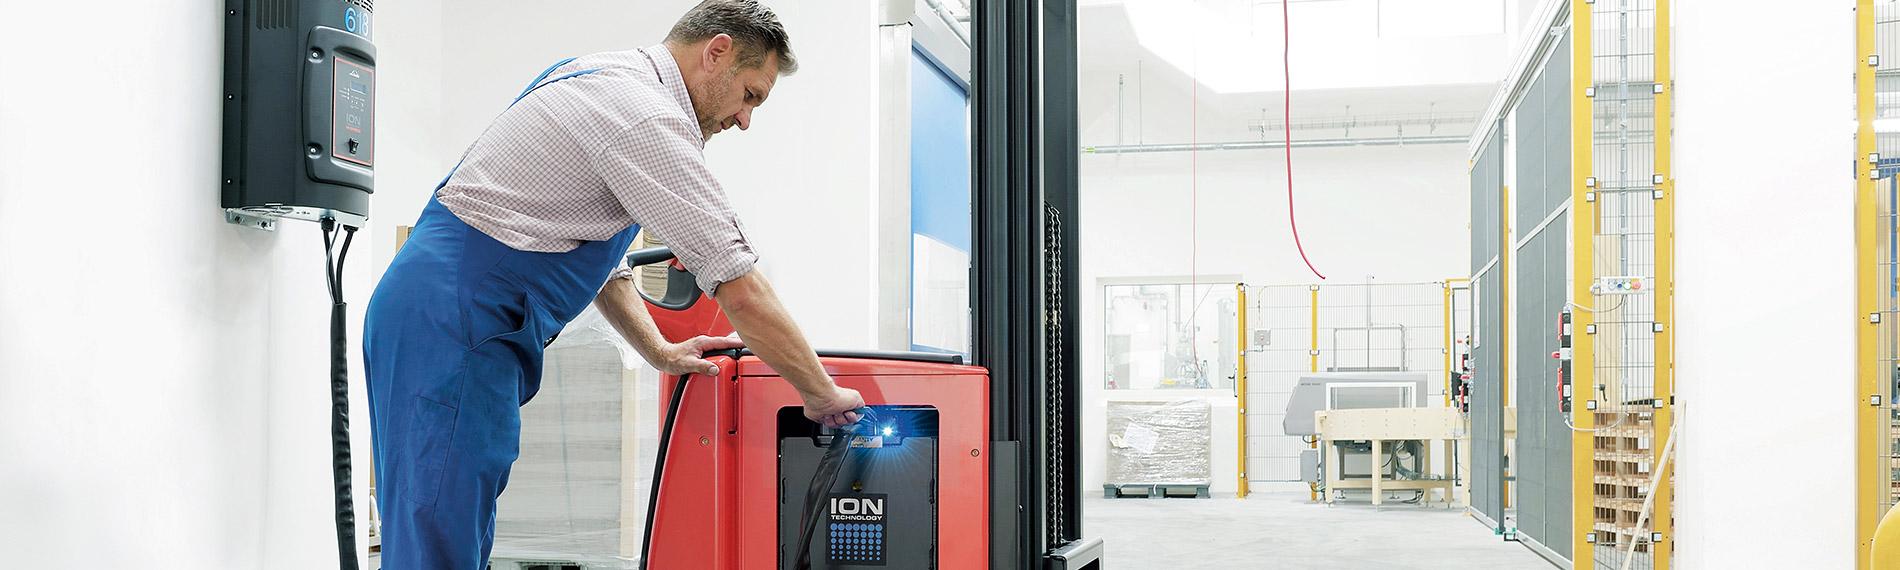 header desktop lithium ionen batterie ladegeraet